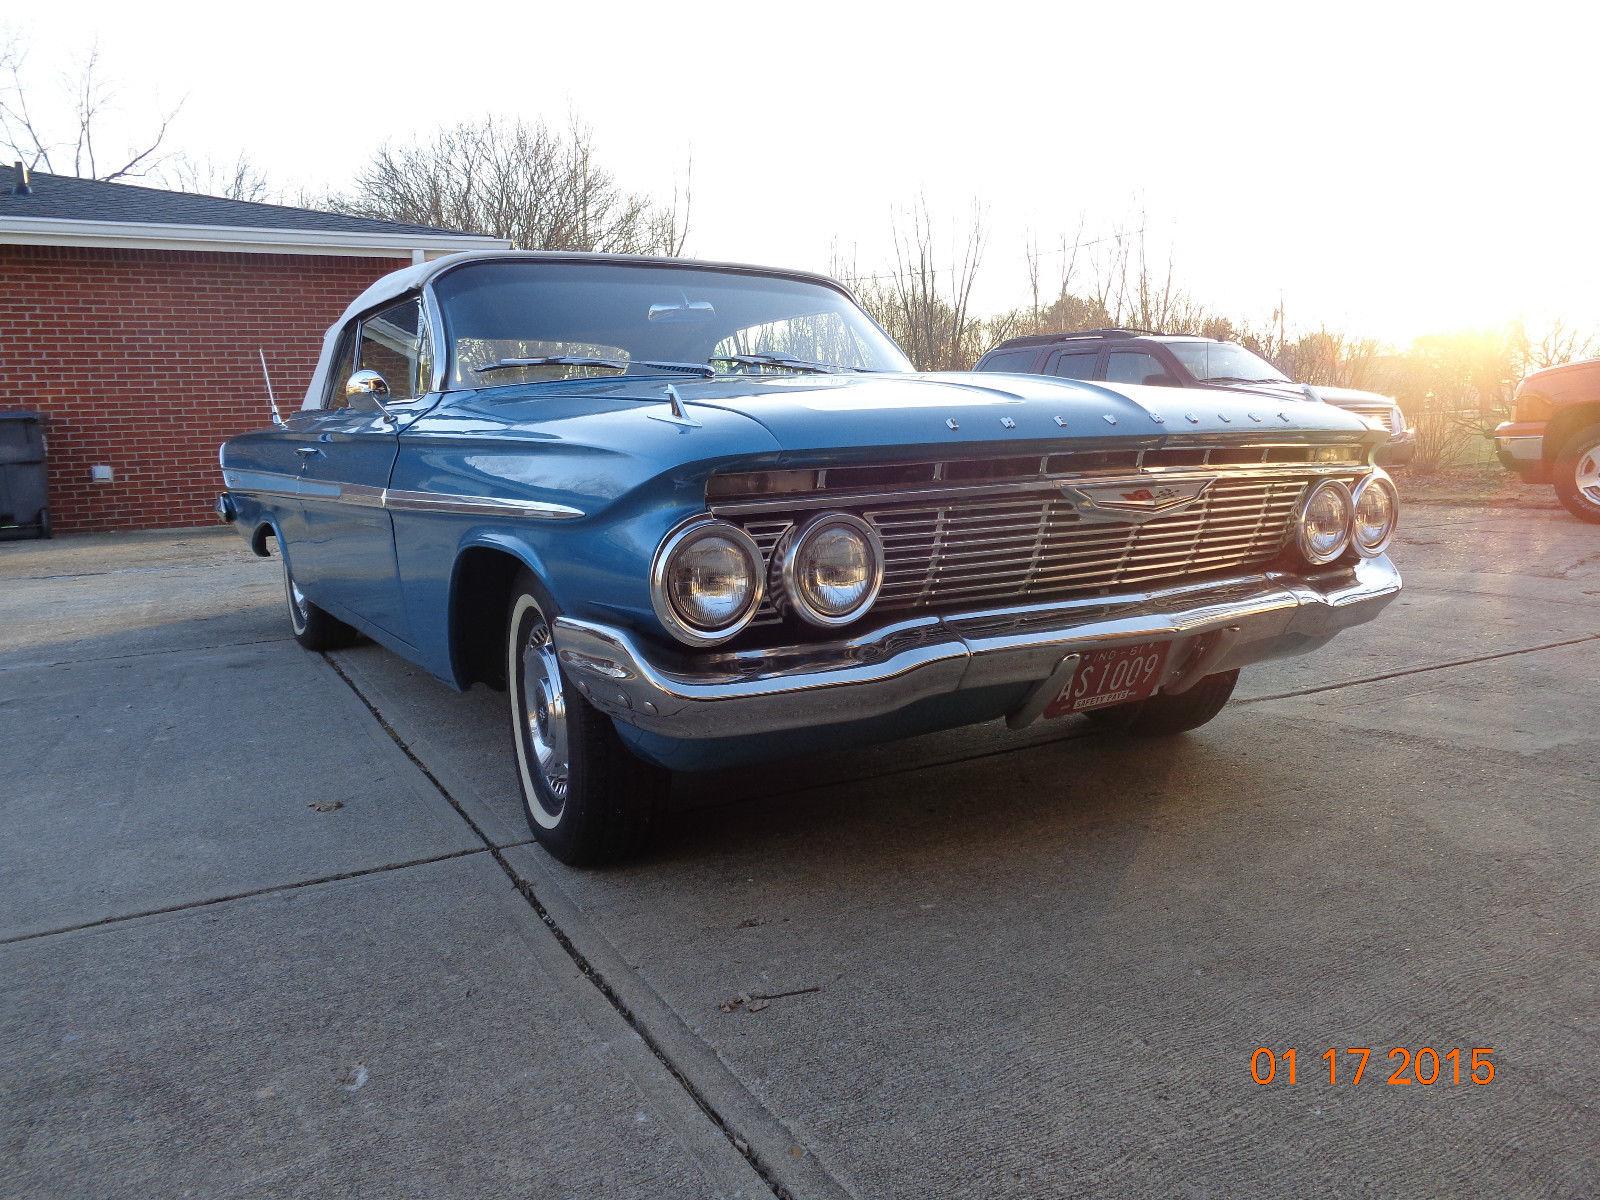 1961 Chevrolet Impala Convertible Restored